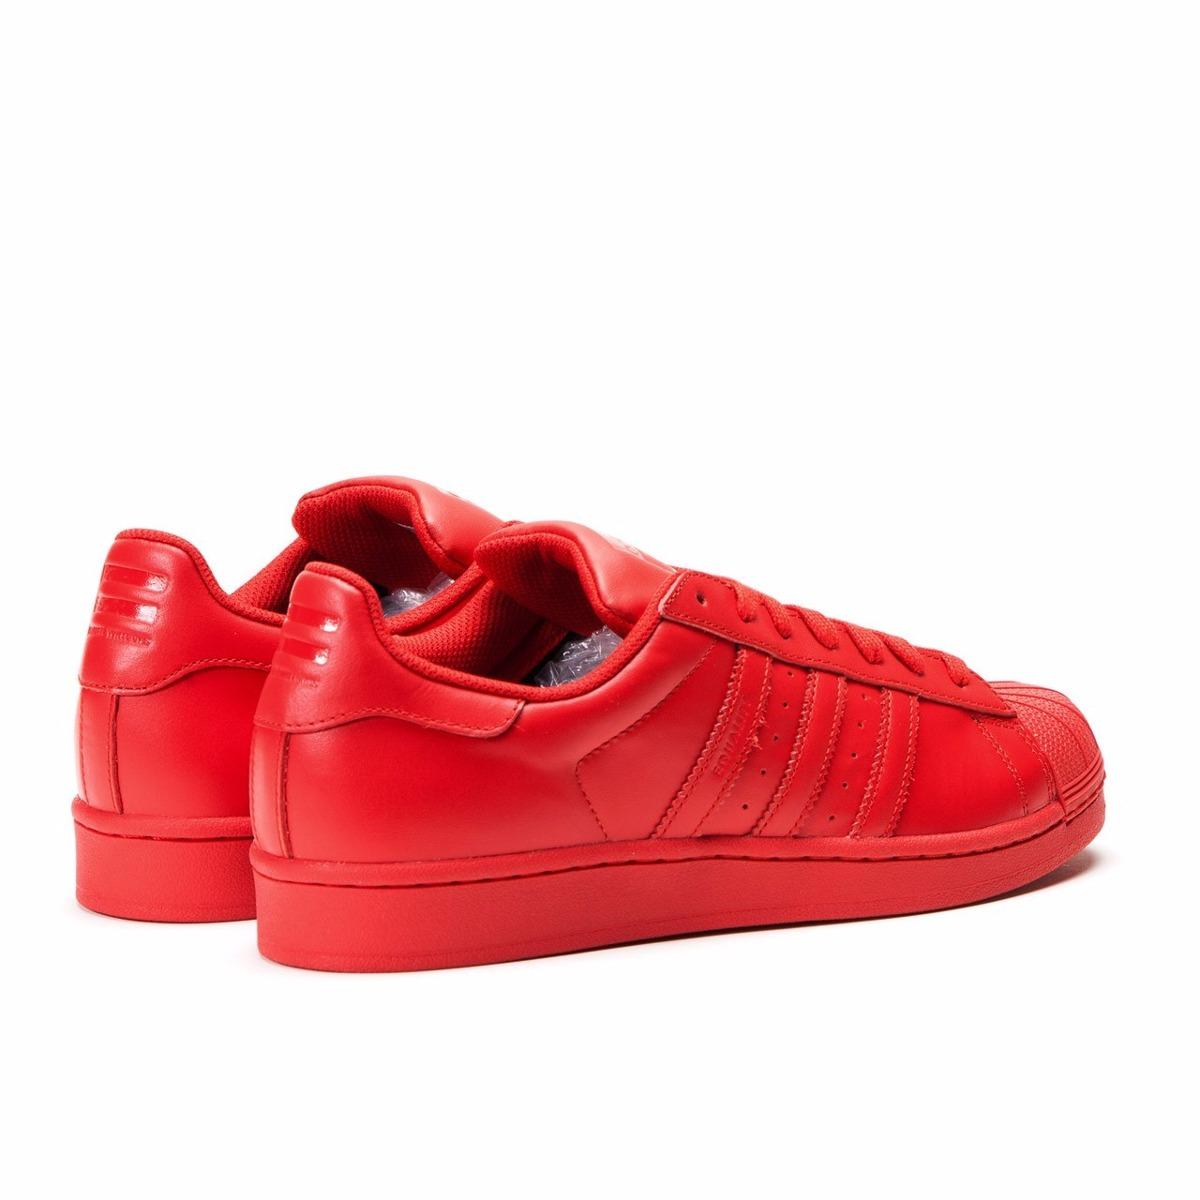 uk availability d598a d802c Original Hombre Superstar Adidas Mujer Zapatillas Supercolor awfR8Hq